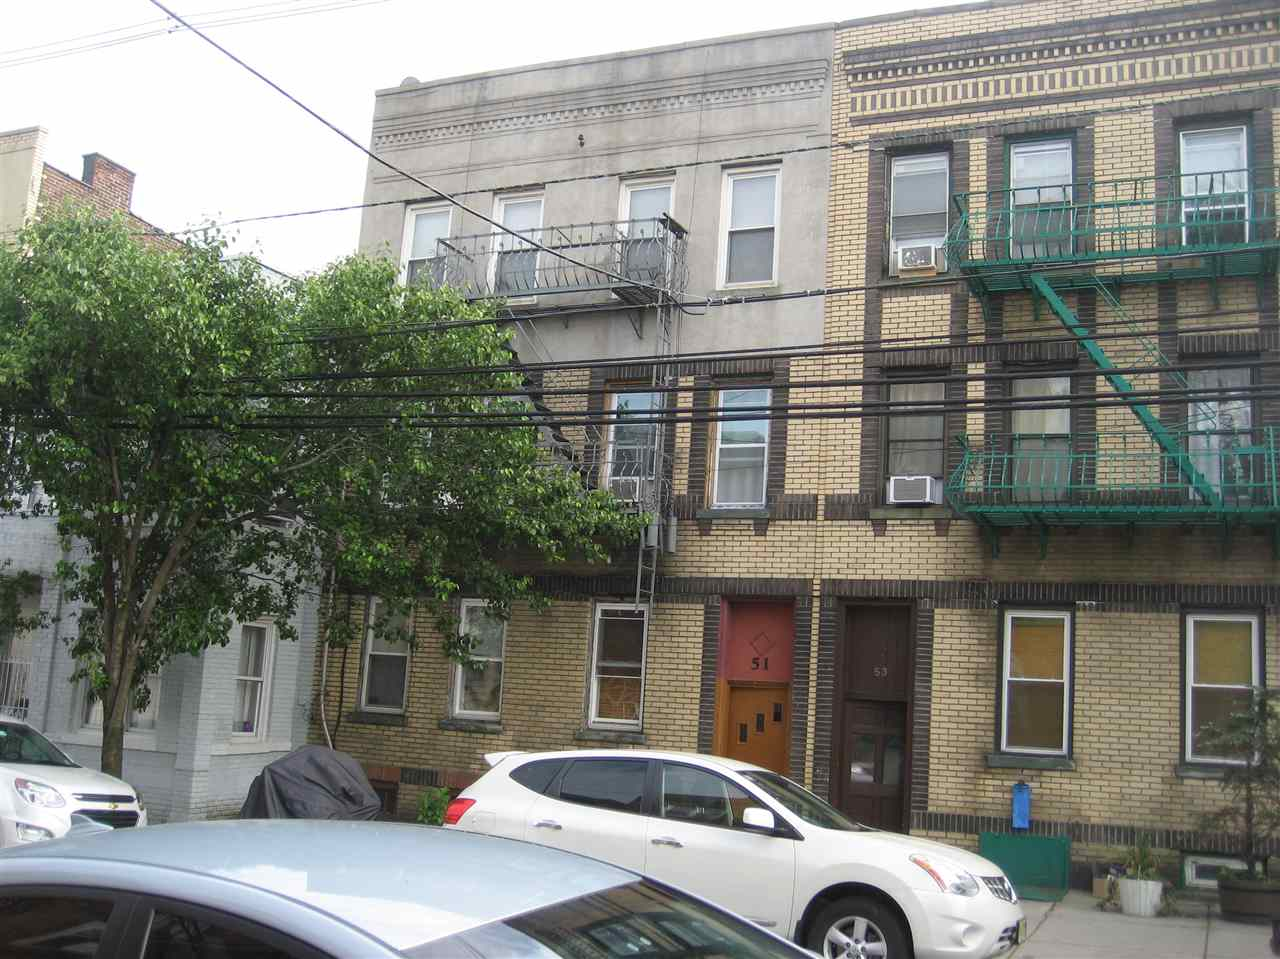 51 66TH ST 4, West New York, NJ 07093